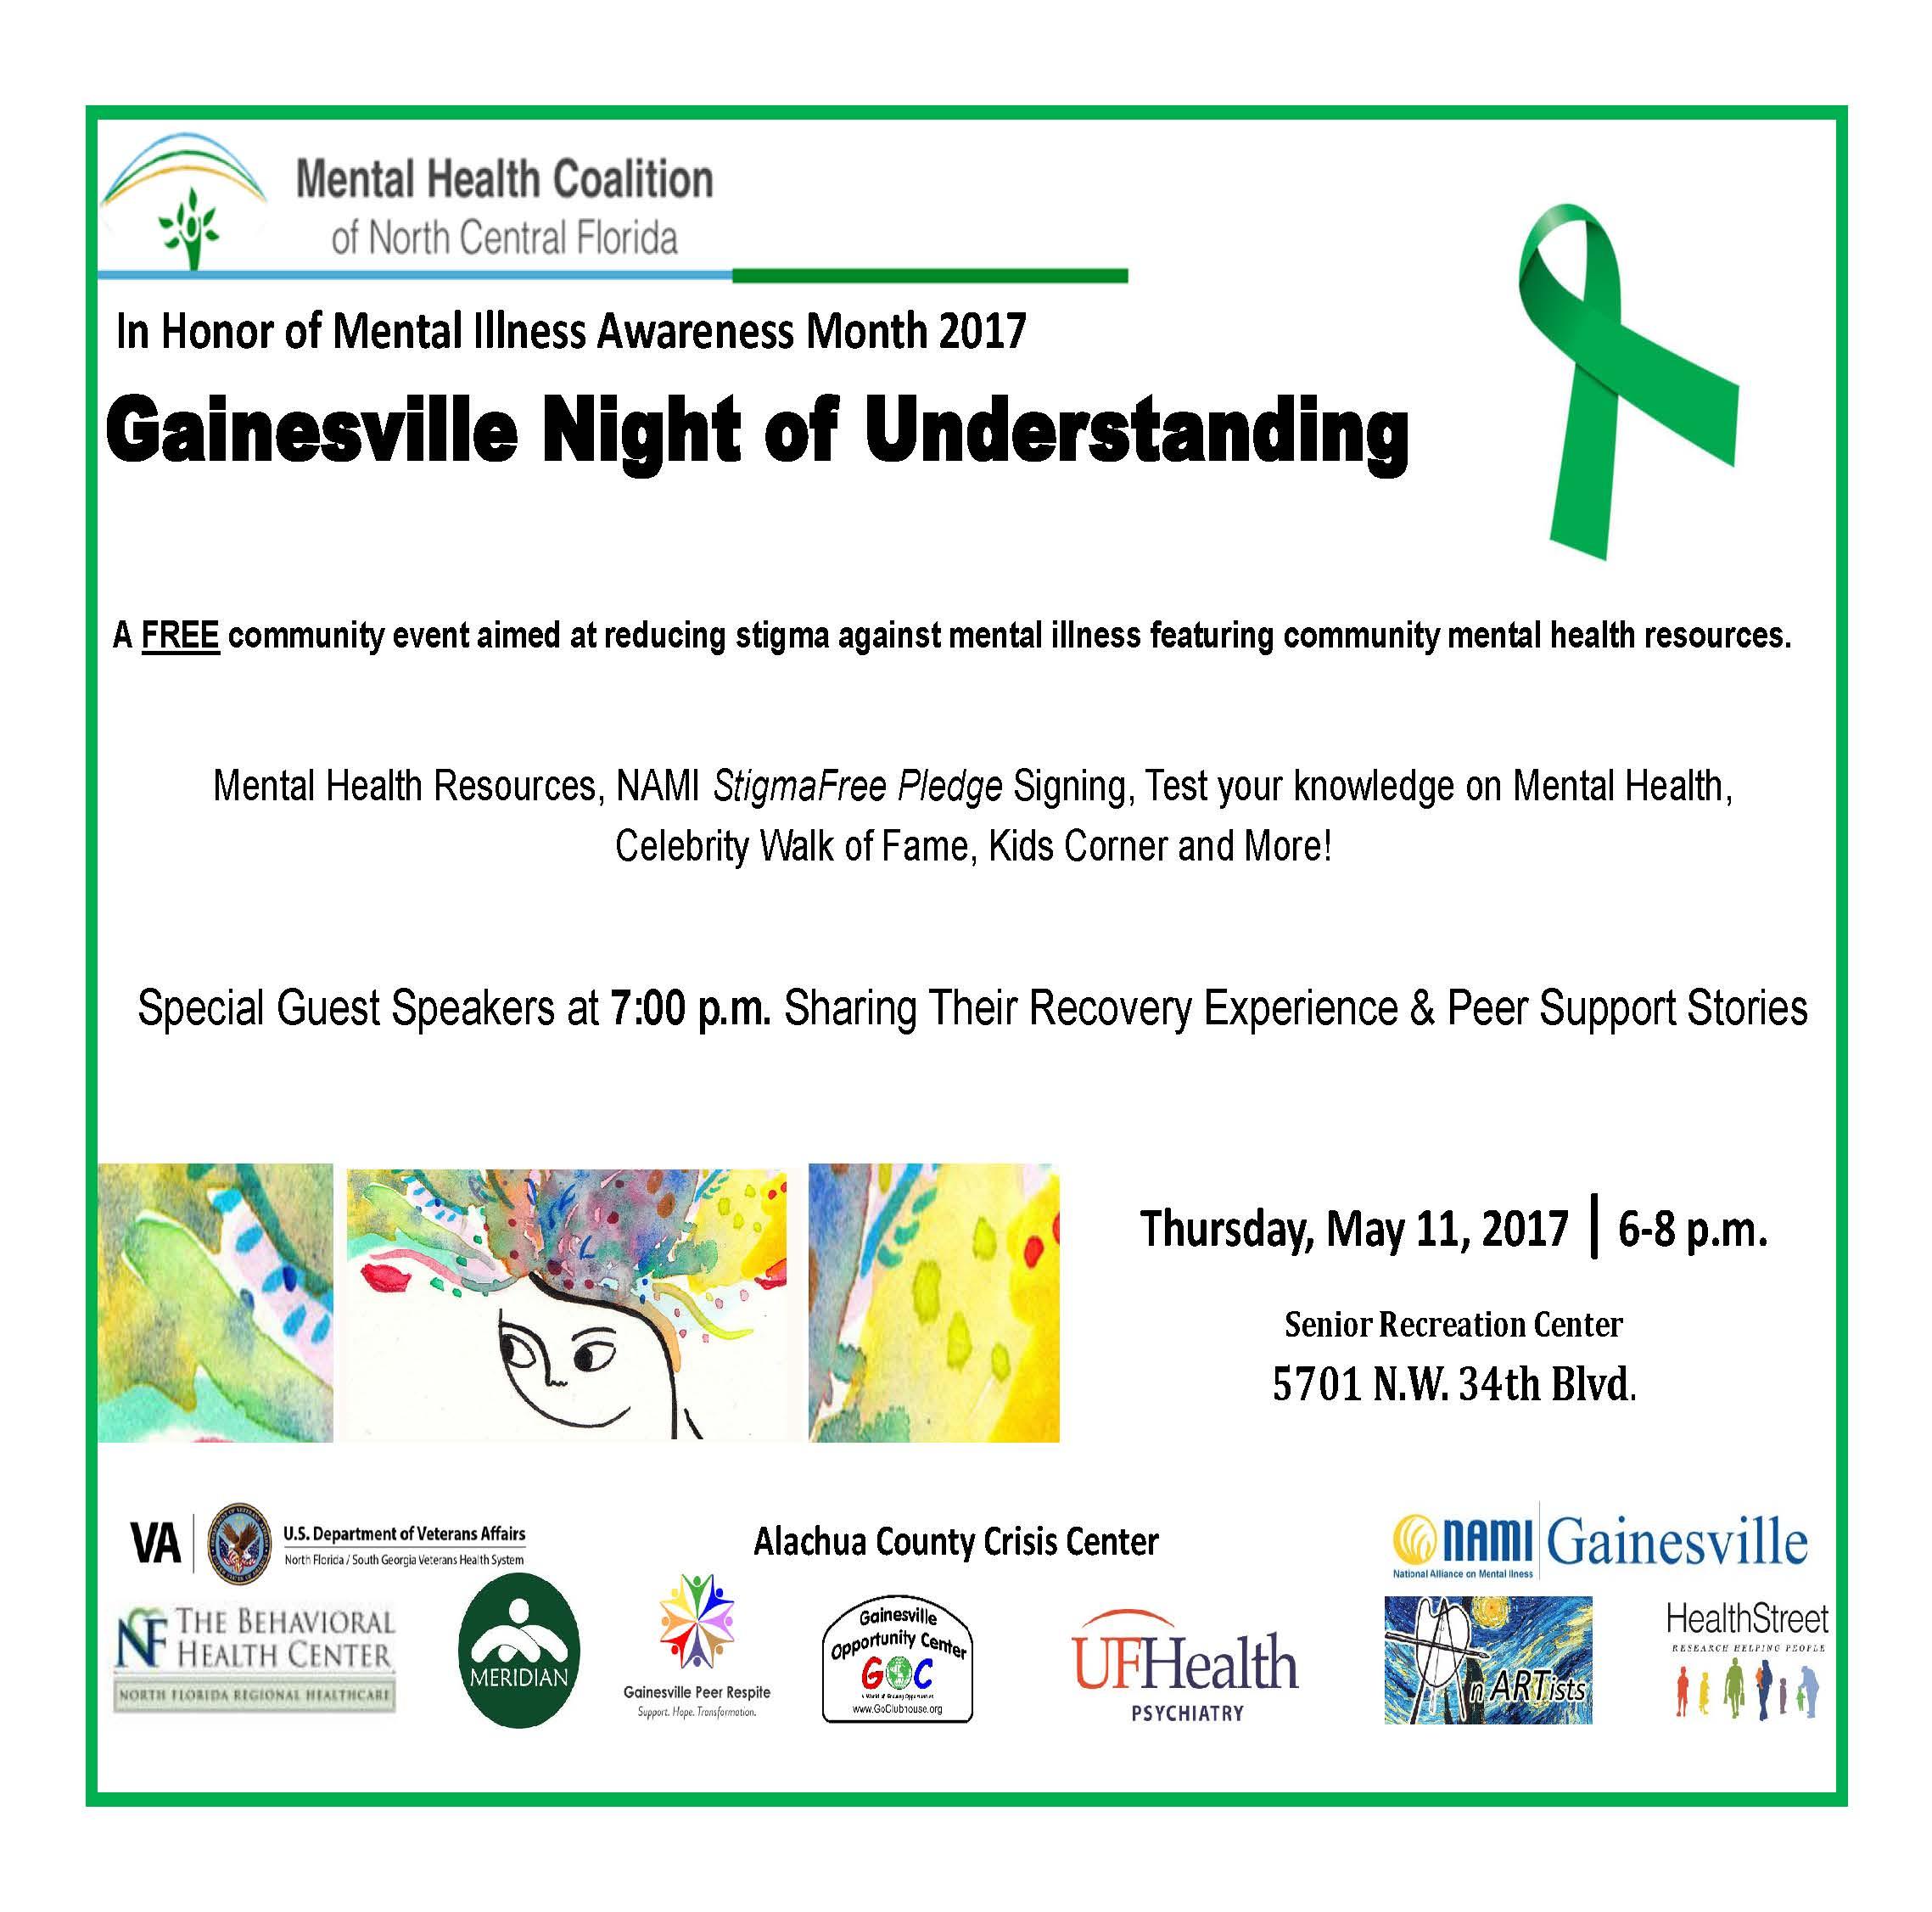 Gainesville Night of Understanding